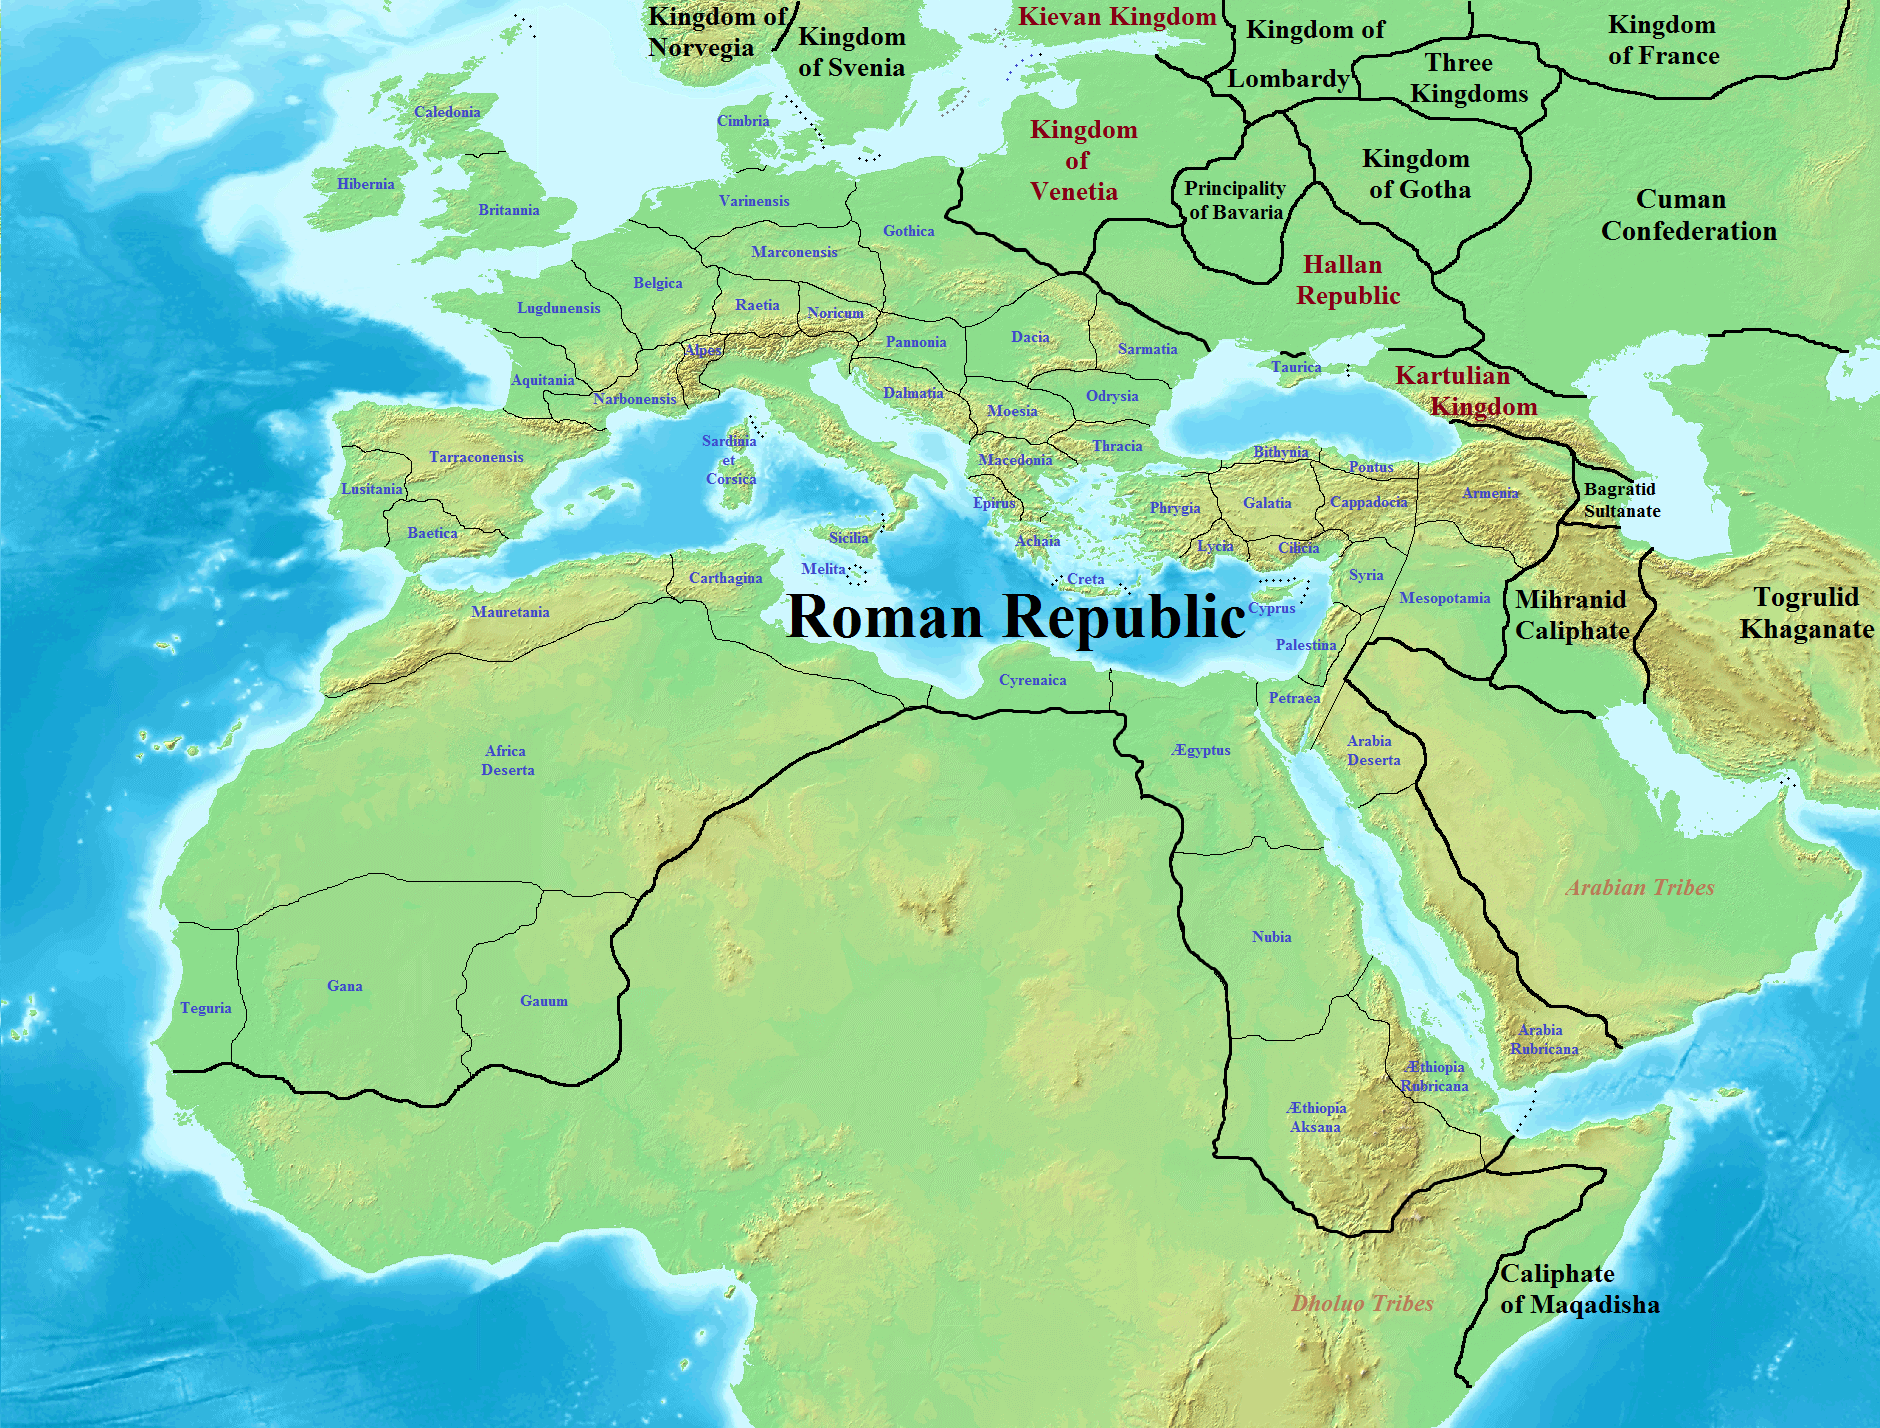 Roman Empire in 1900 AUC (Superpowers)